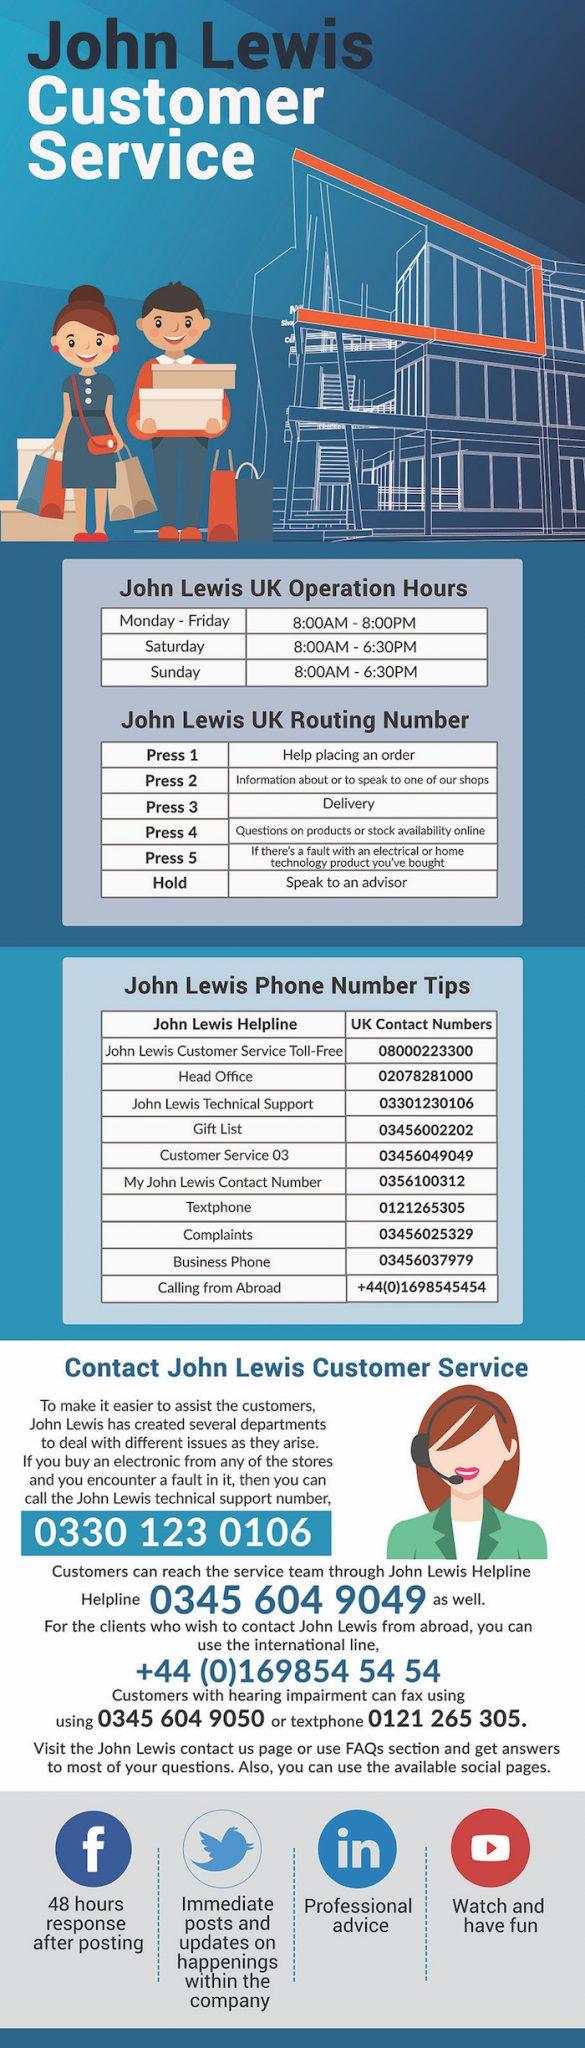 John Lewis Contact Numbers UK